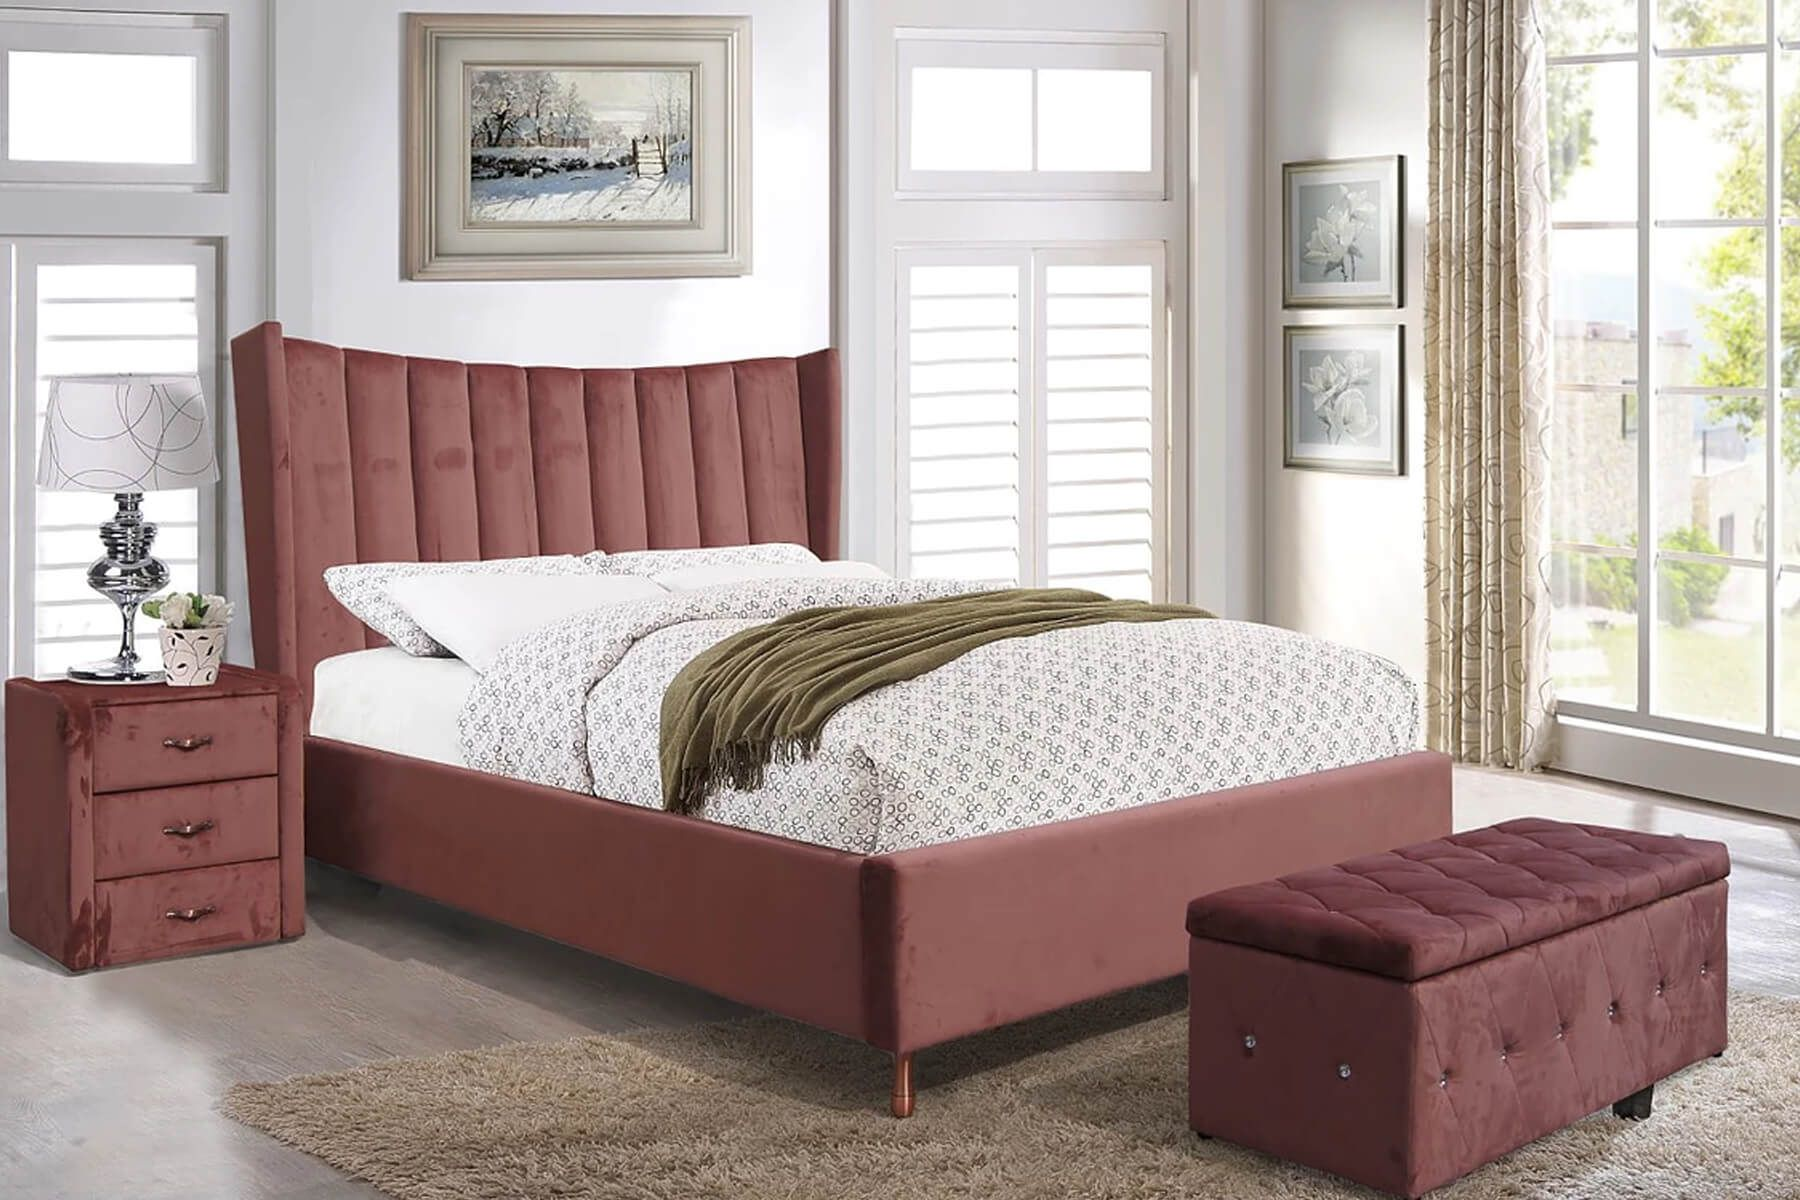 Ireland S Biggest Bed Store Furniture Store Myfurniture In